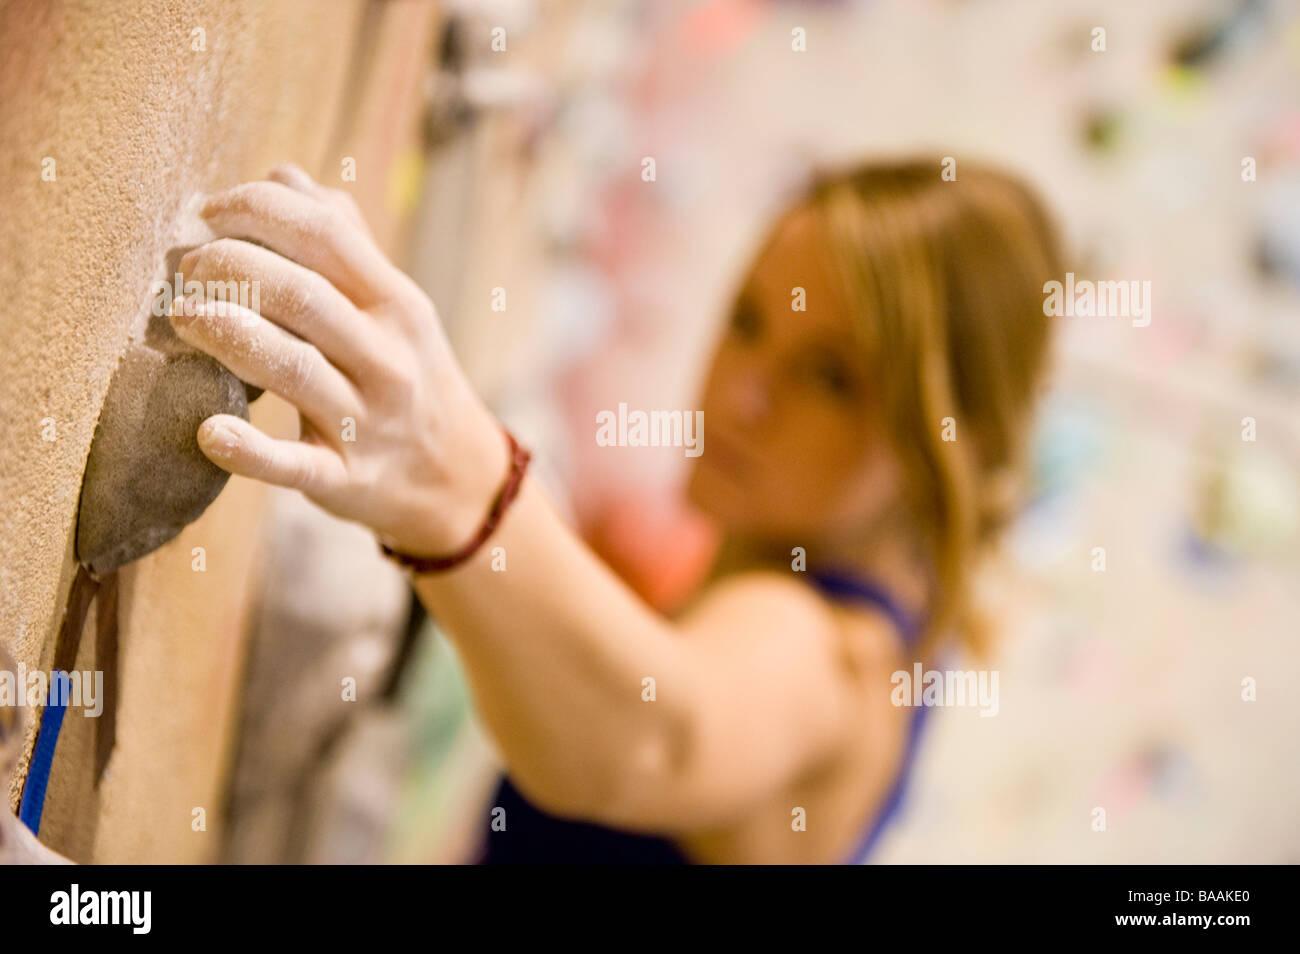 A woman rock climbing indoors at Estes Park, Colorado. - Stock Image